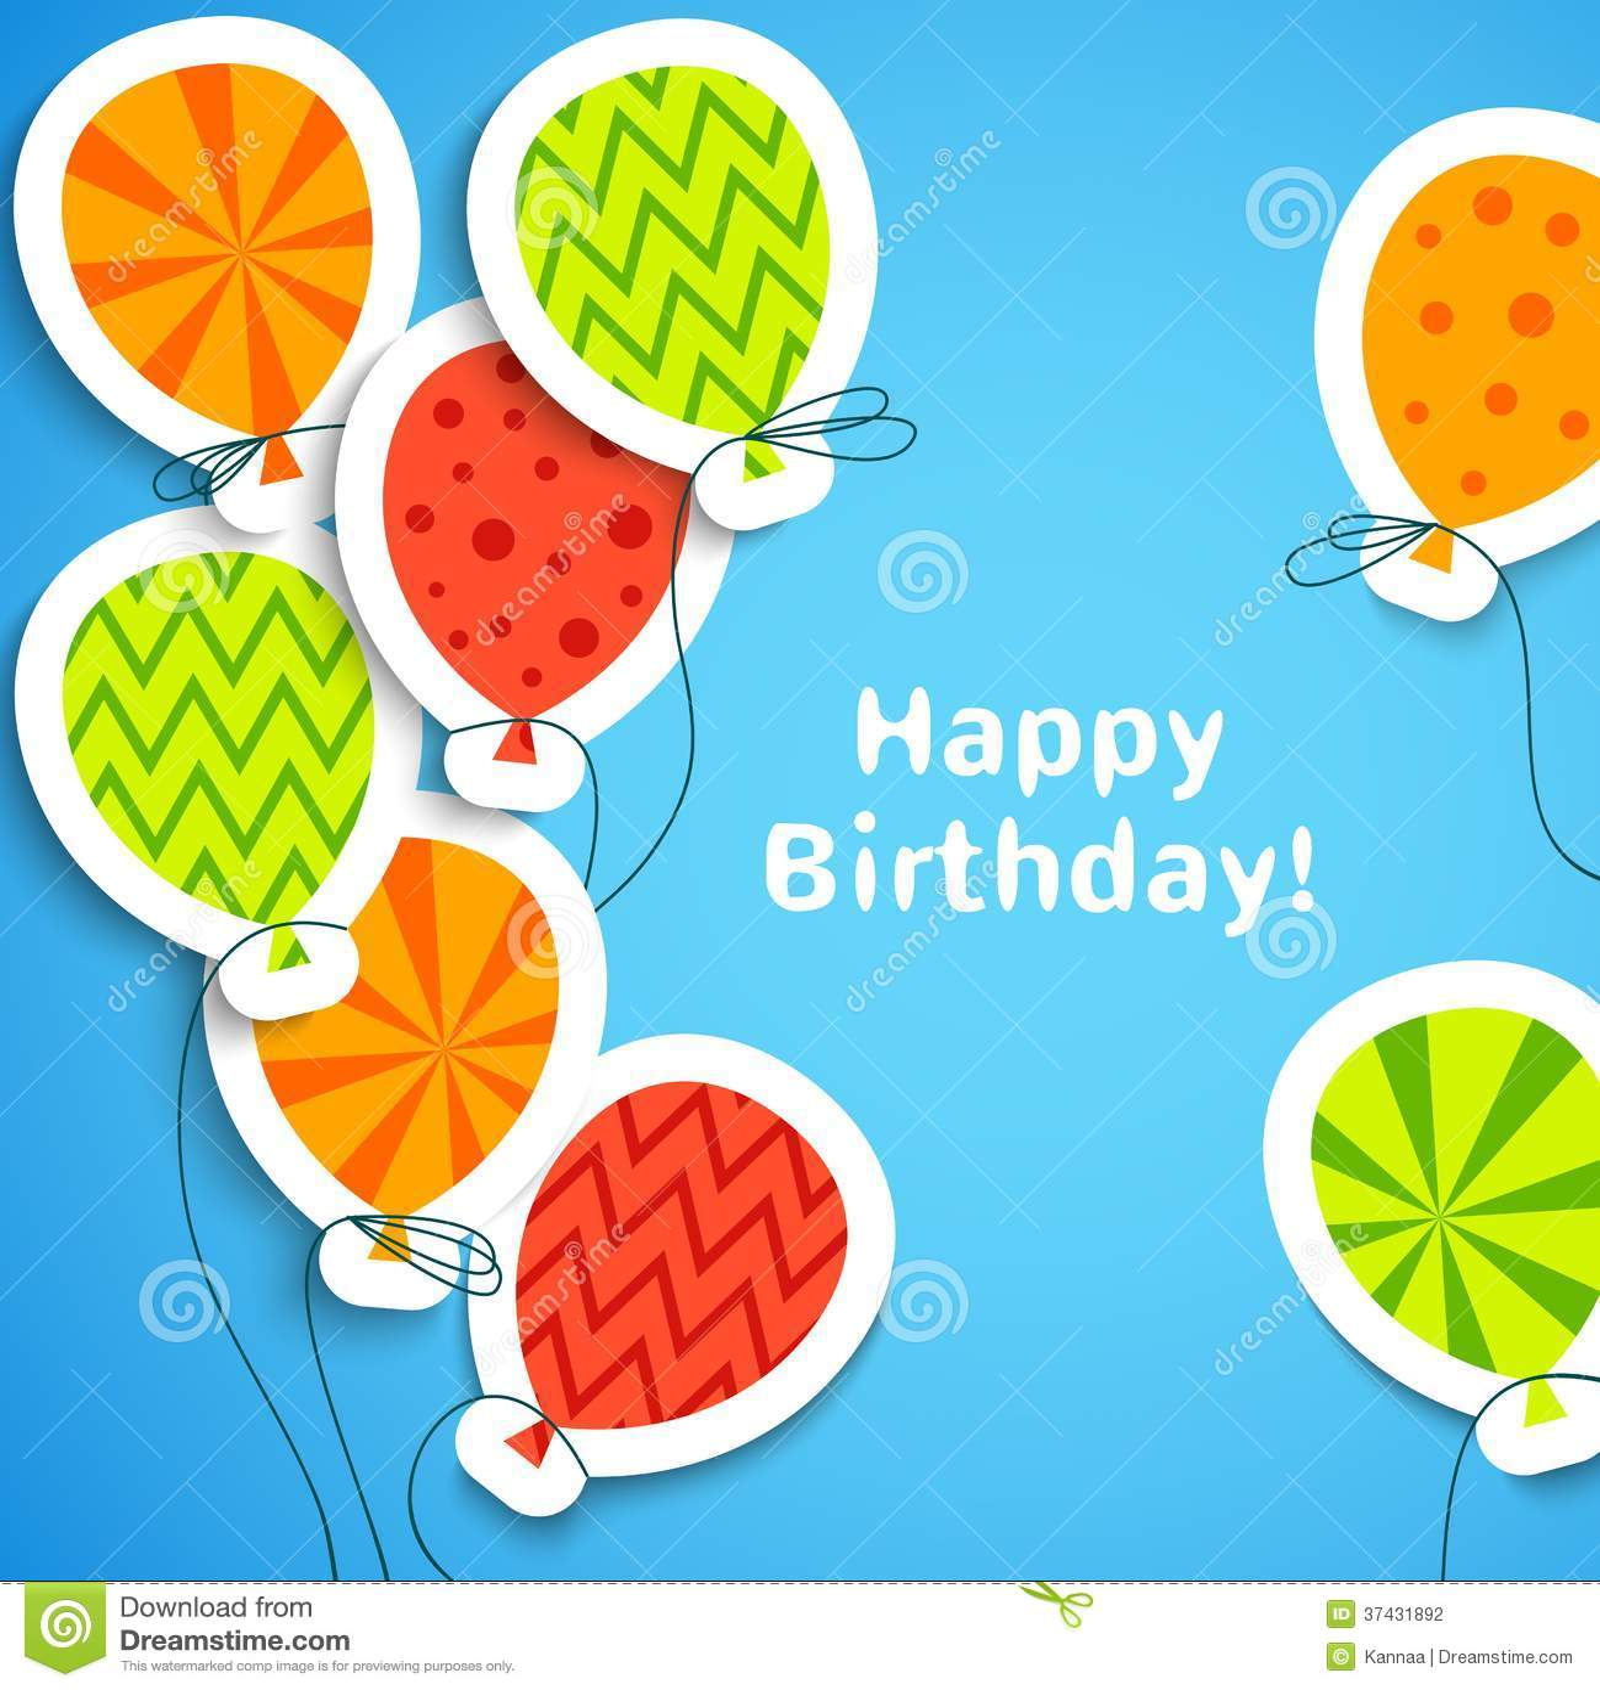 Happy birthday postcard with balloons. Vector